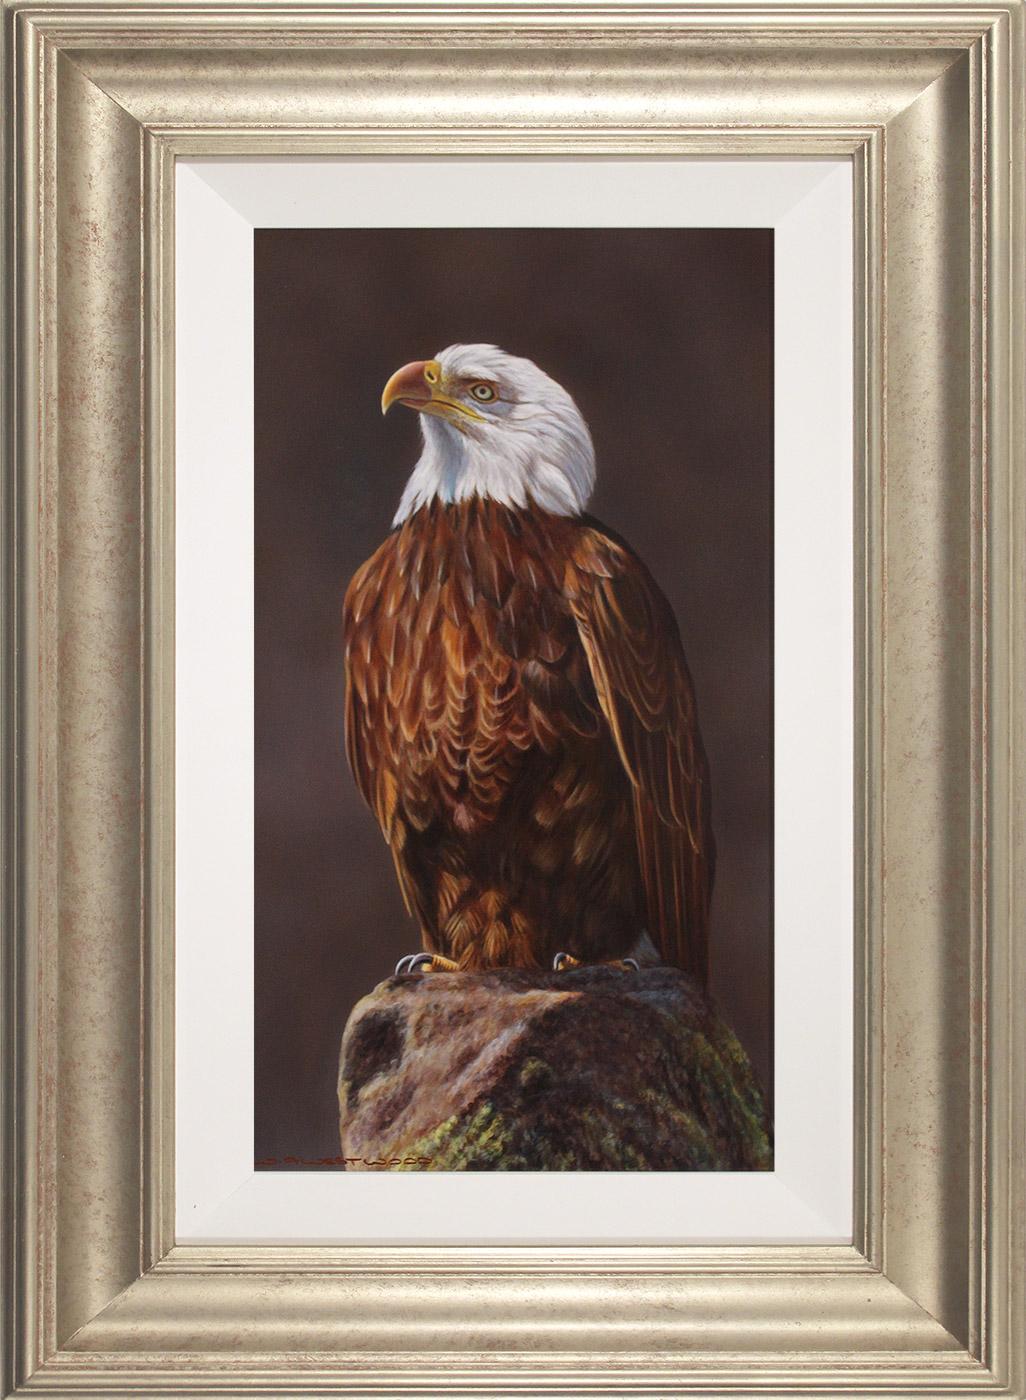 Wayne Westwood, Original oil painting on panel, American Bald Eagle  Click to enlarge